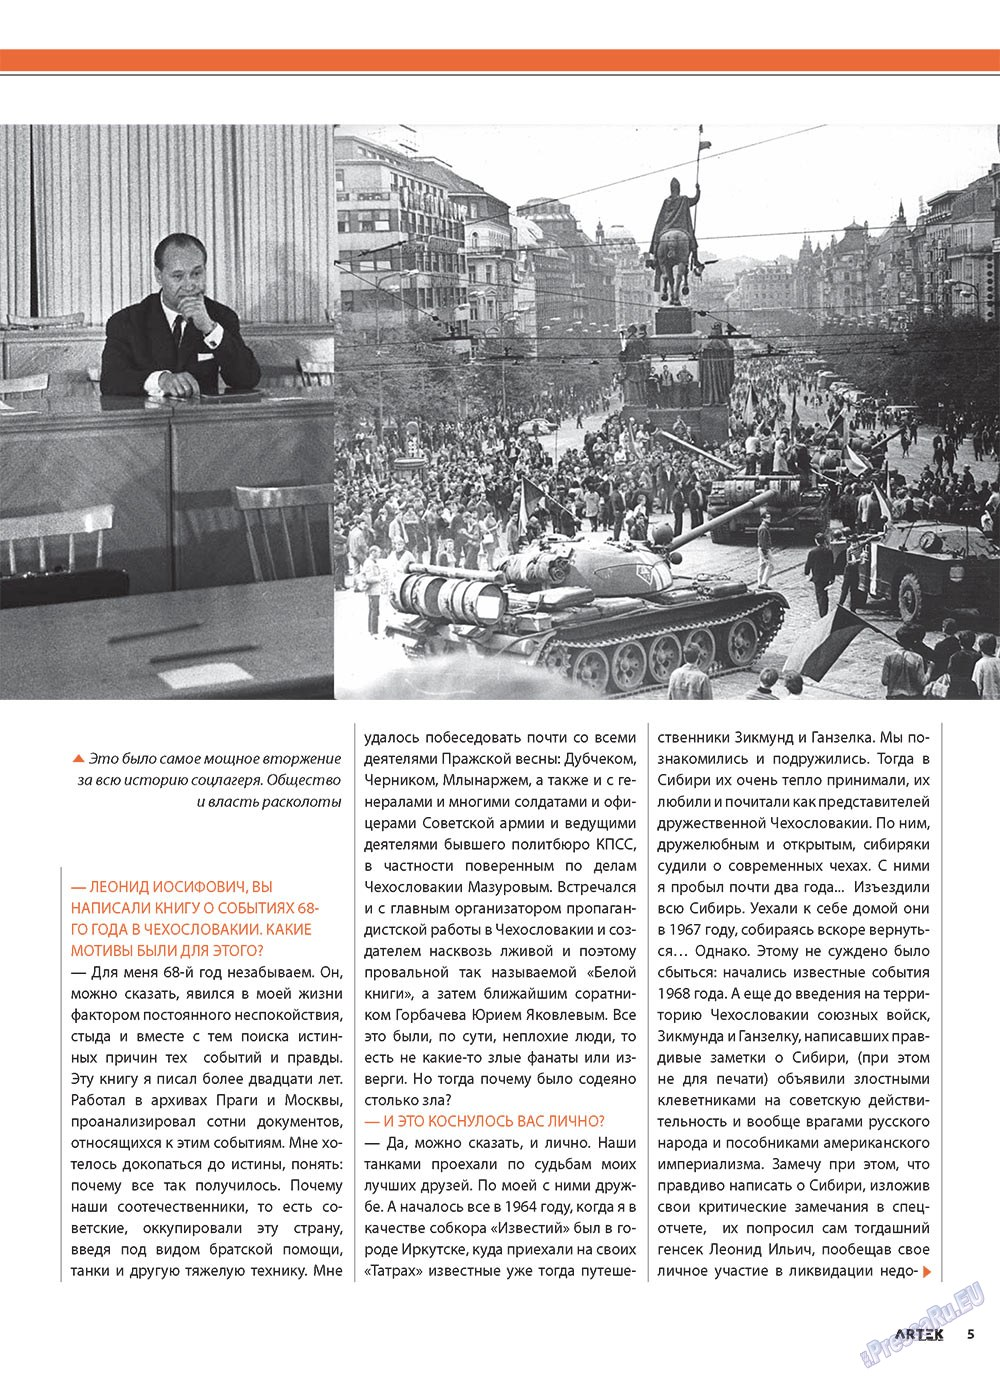 Артек (журнал). 2010 год, номер 4, стр. 7